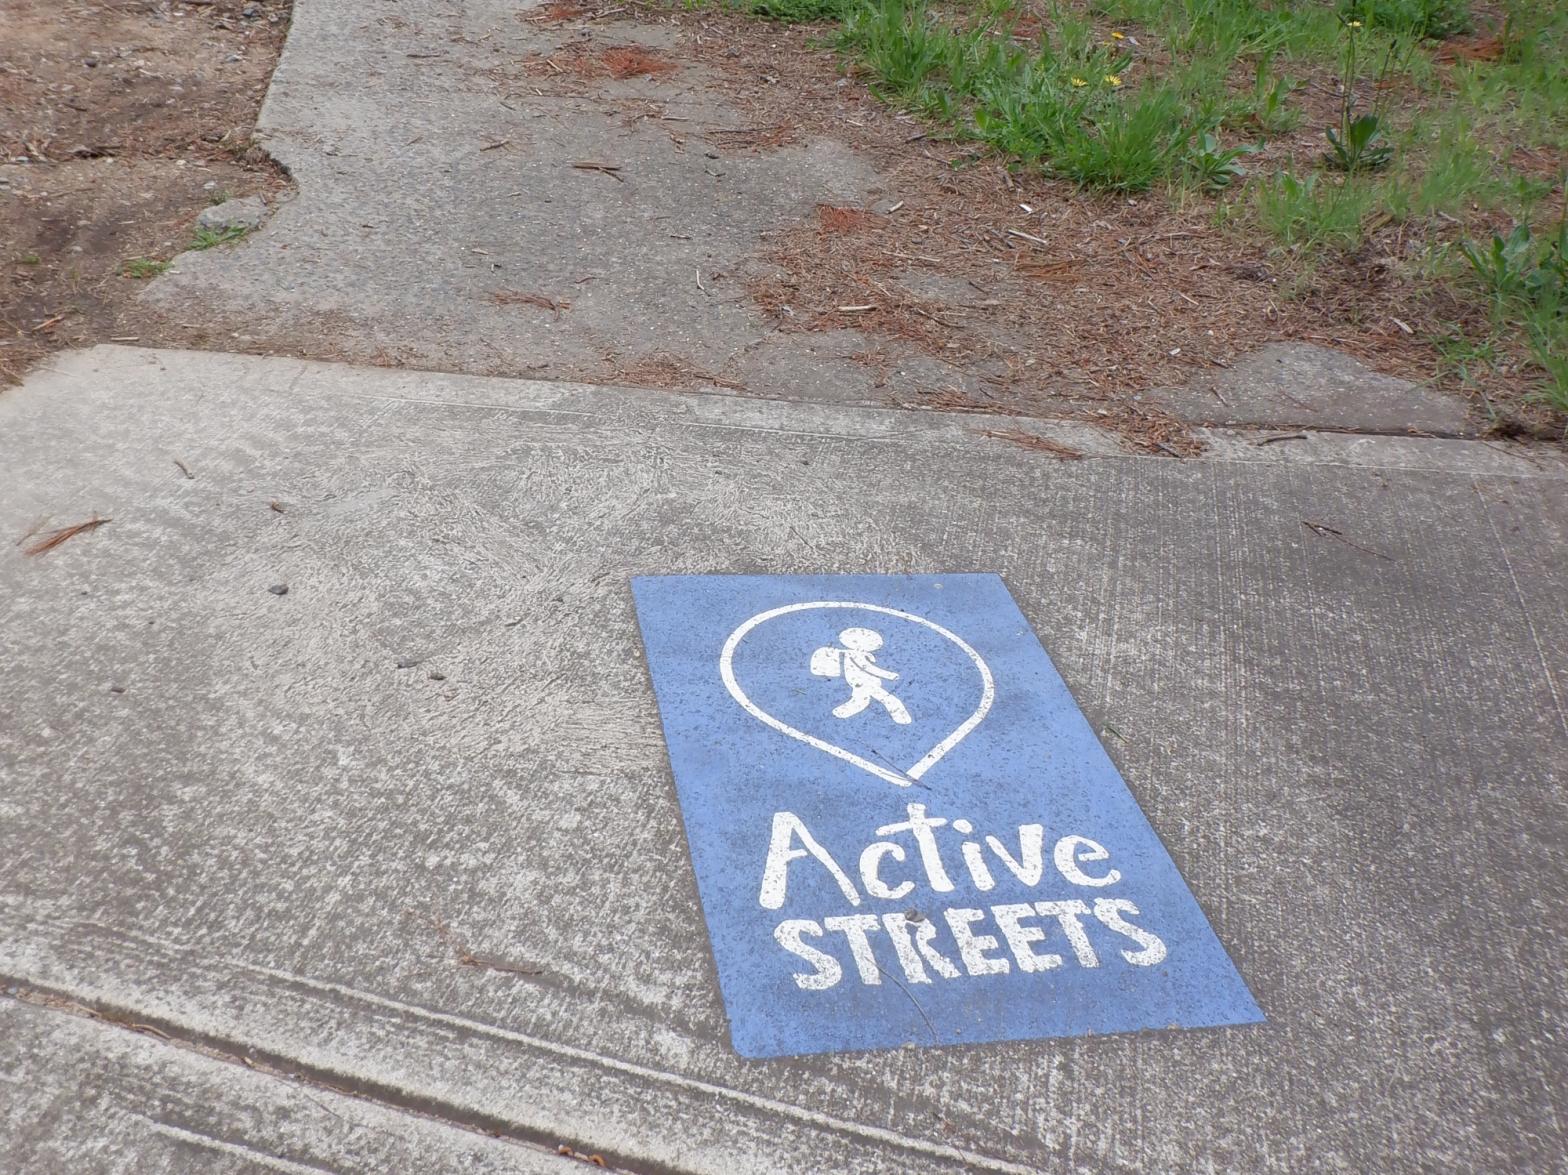 Active Street sign close to Evatt shops, Belconnen